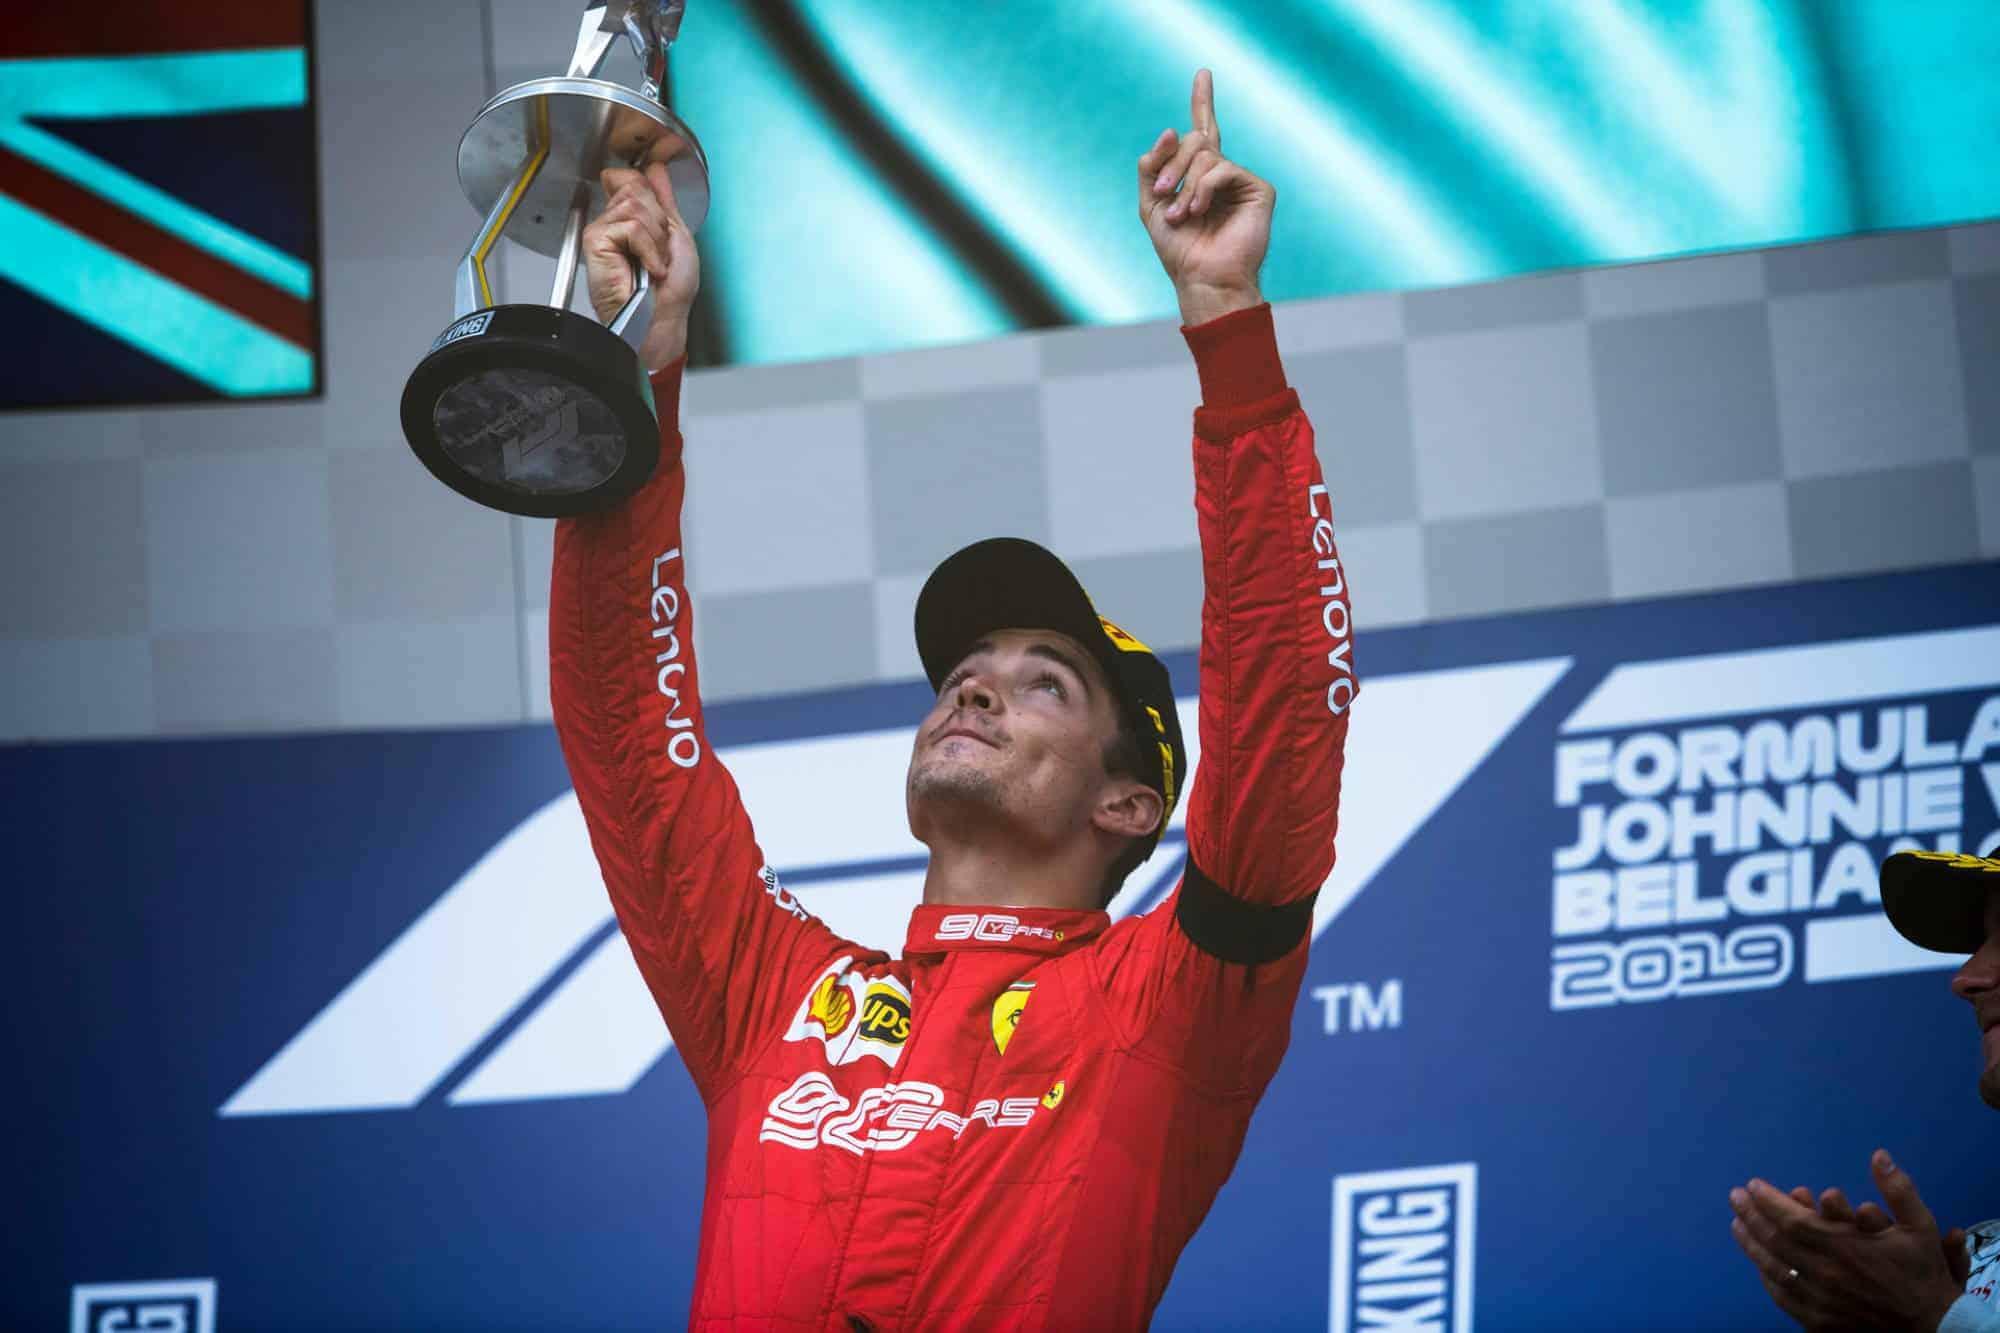 Charles Leclerc Ferrari Belgian GP F1 2019 on the podium Photo Ferrari